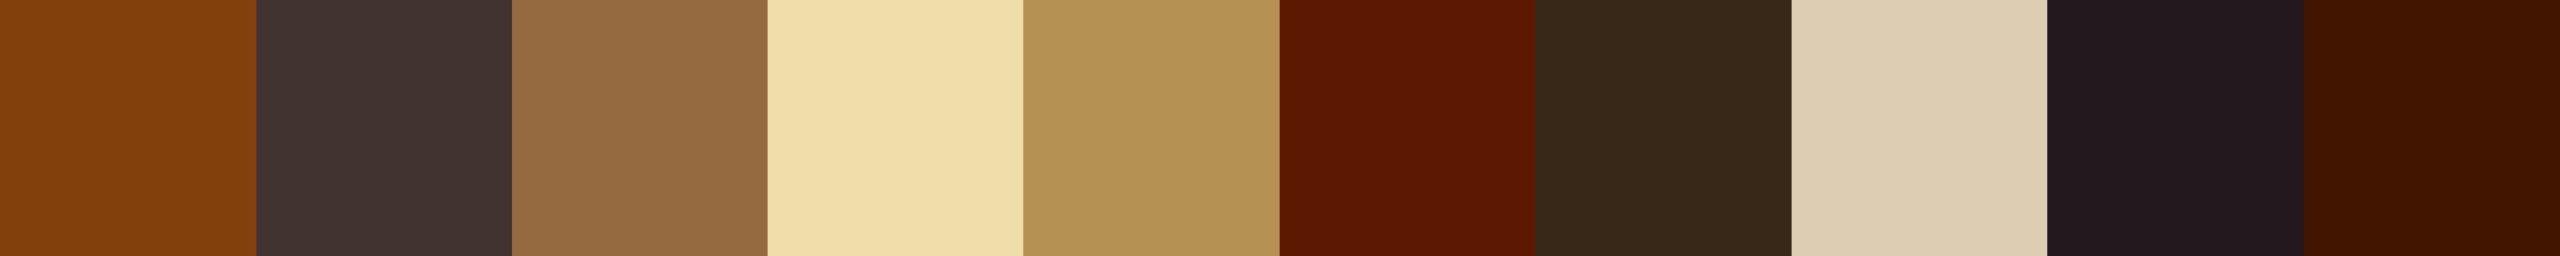 703 Erista Color Palette